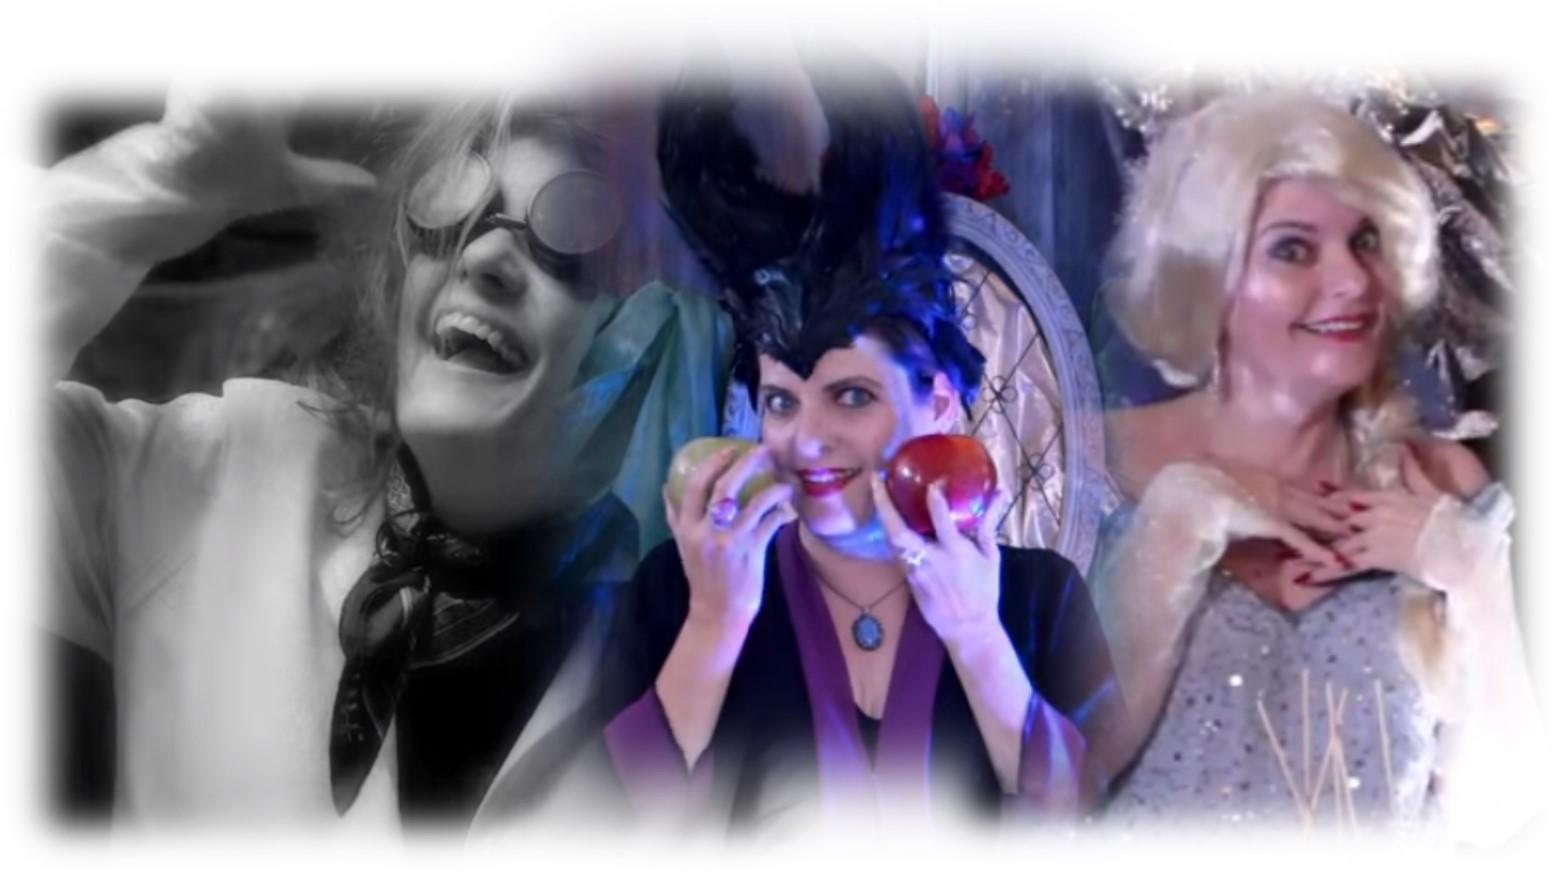 Weekend Watch: Indie-Annie Jones' Goofy World of Cosplay and Crafts